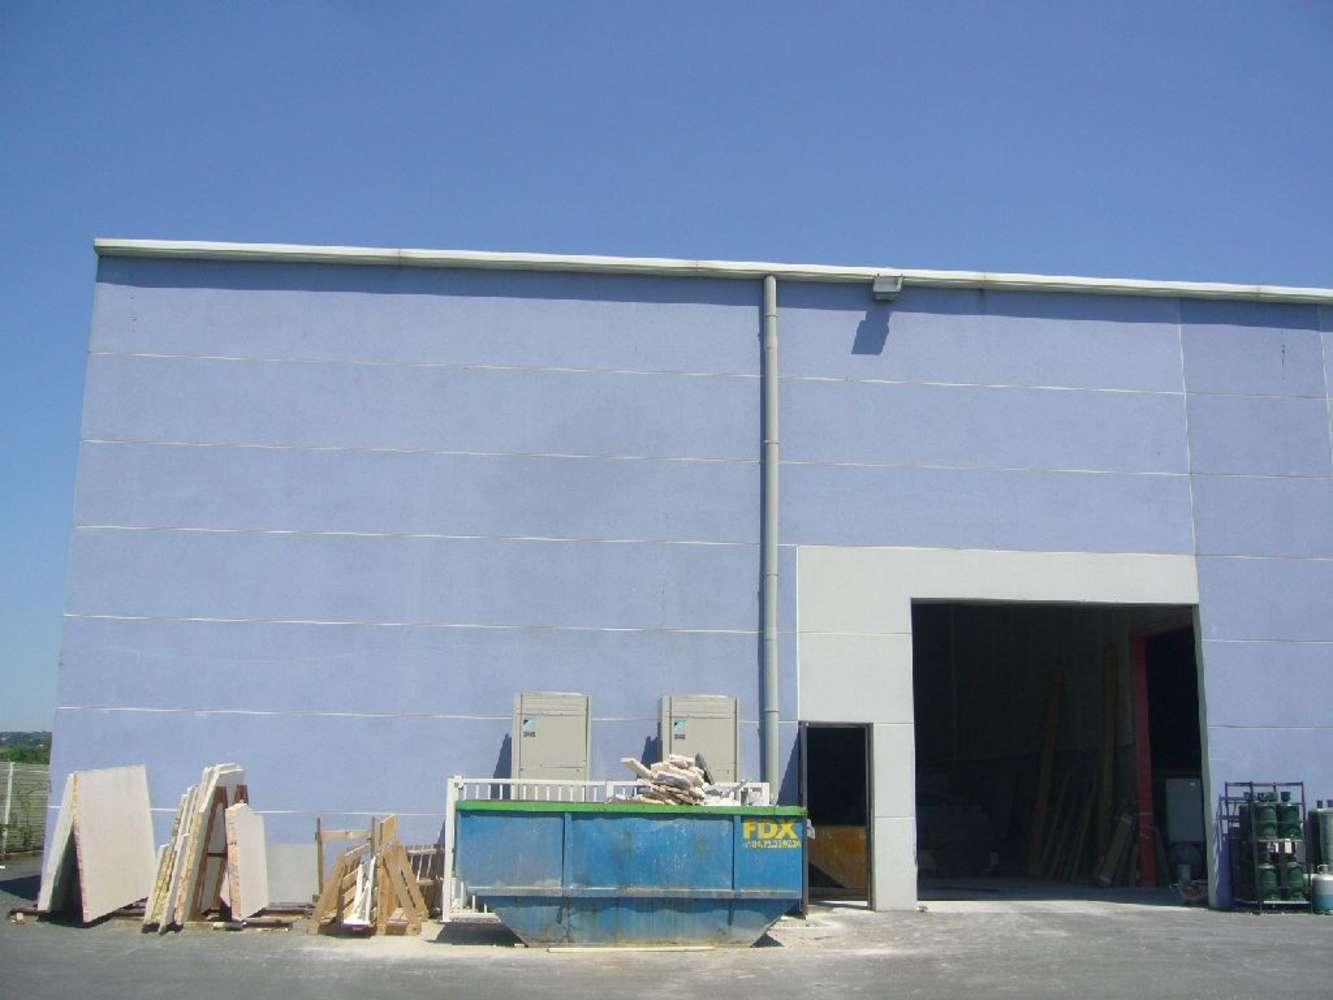 Activités/entrepôt Limonest, 69760 - Location bâtiment mixte TECHLID (Lyon) - 9837133